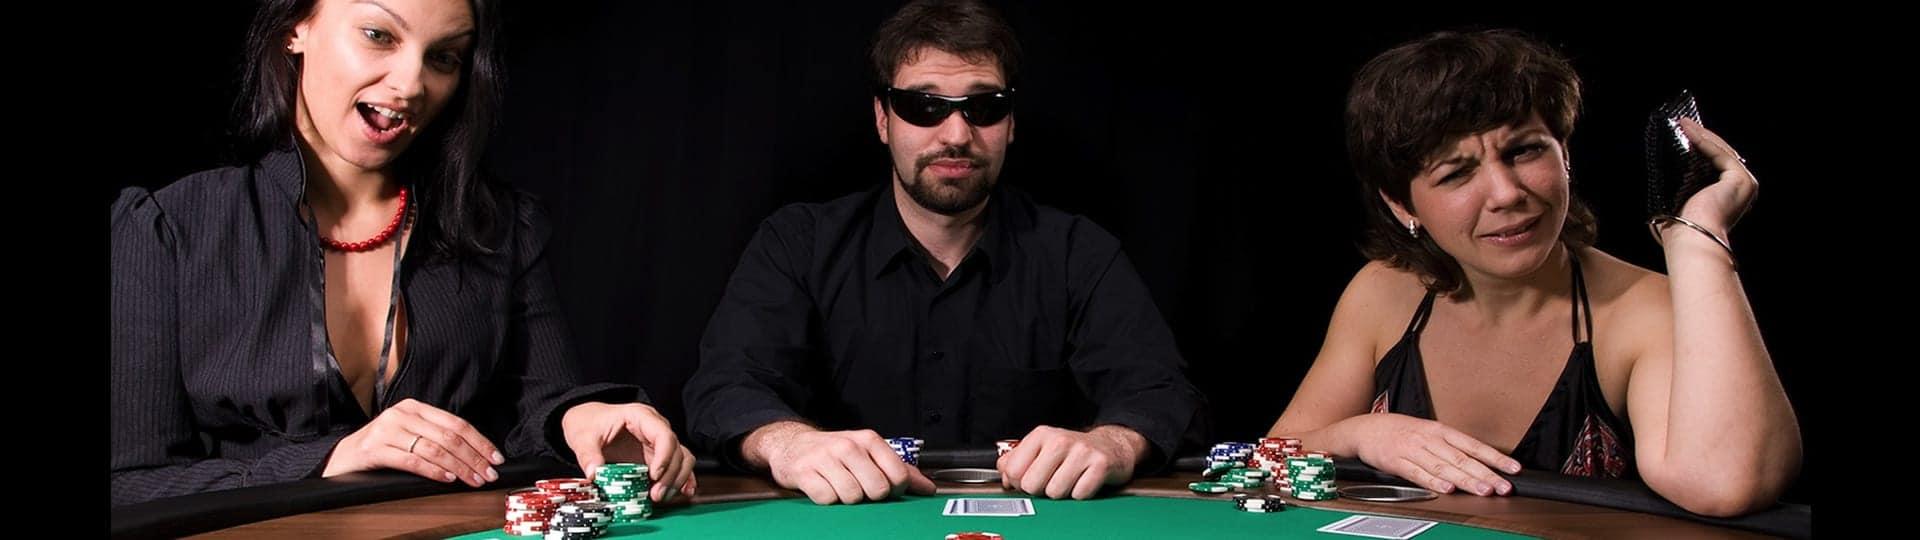 slide-6-casino